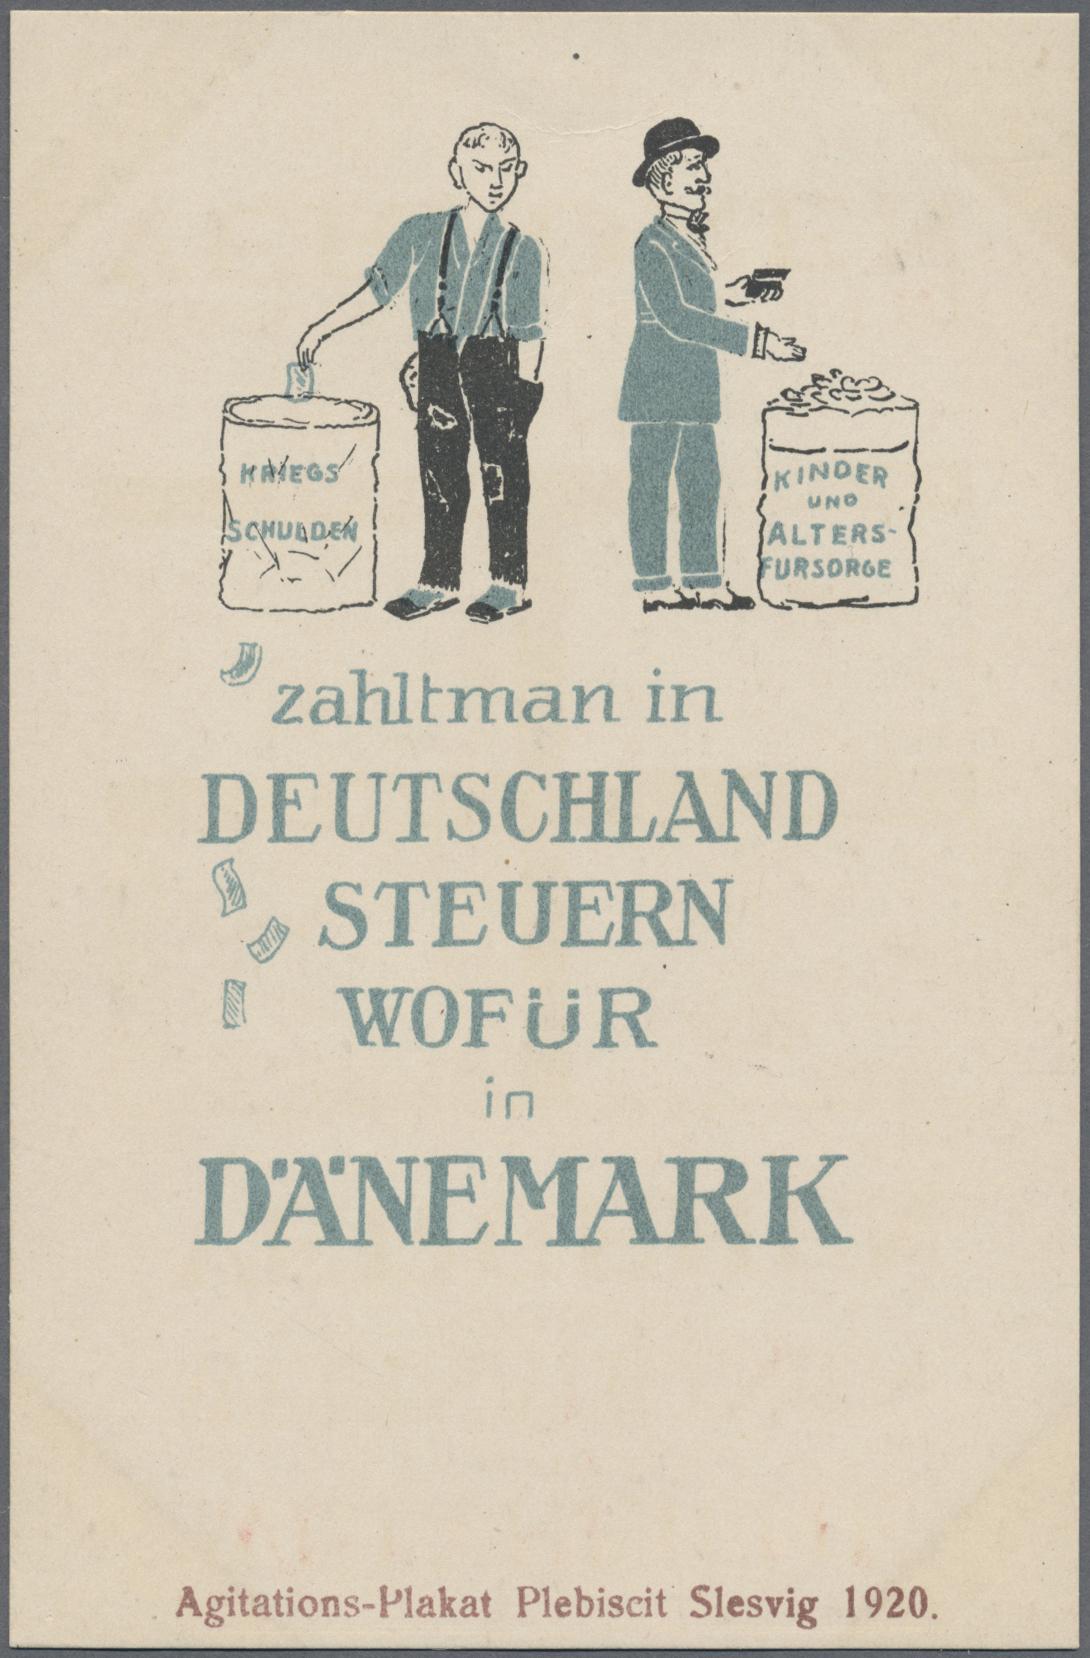 Lot 28888 - Deutsche Abstimmungsgebiete: Schleswig  -  Auktionshaus Christoph Gärtner GmbH & Co. KG Sale #46 Gollcetions Germany - including the suplement